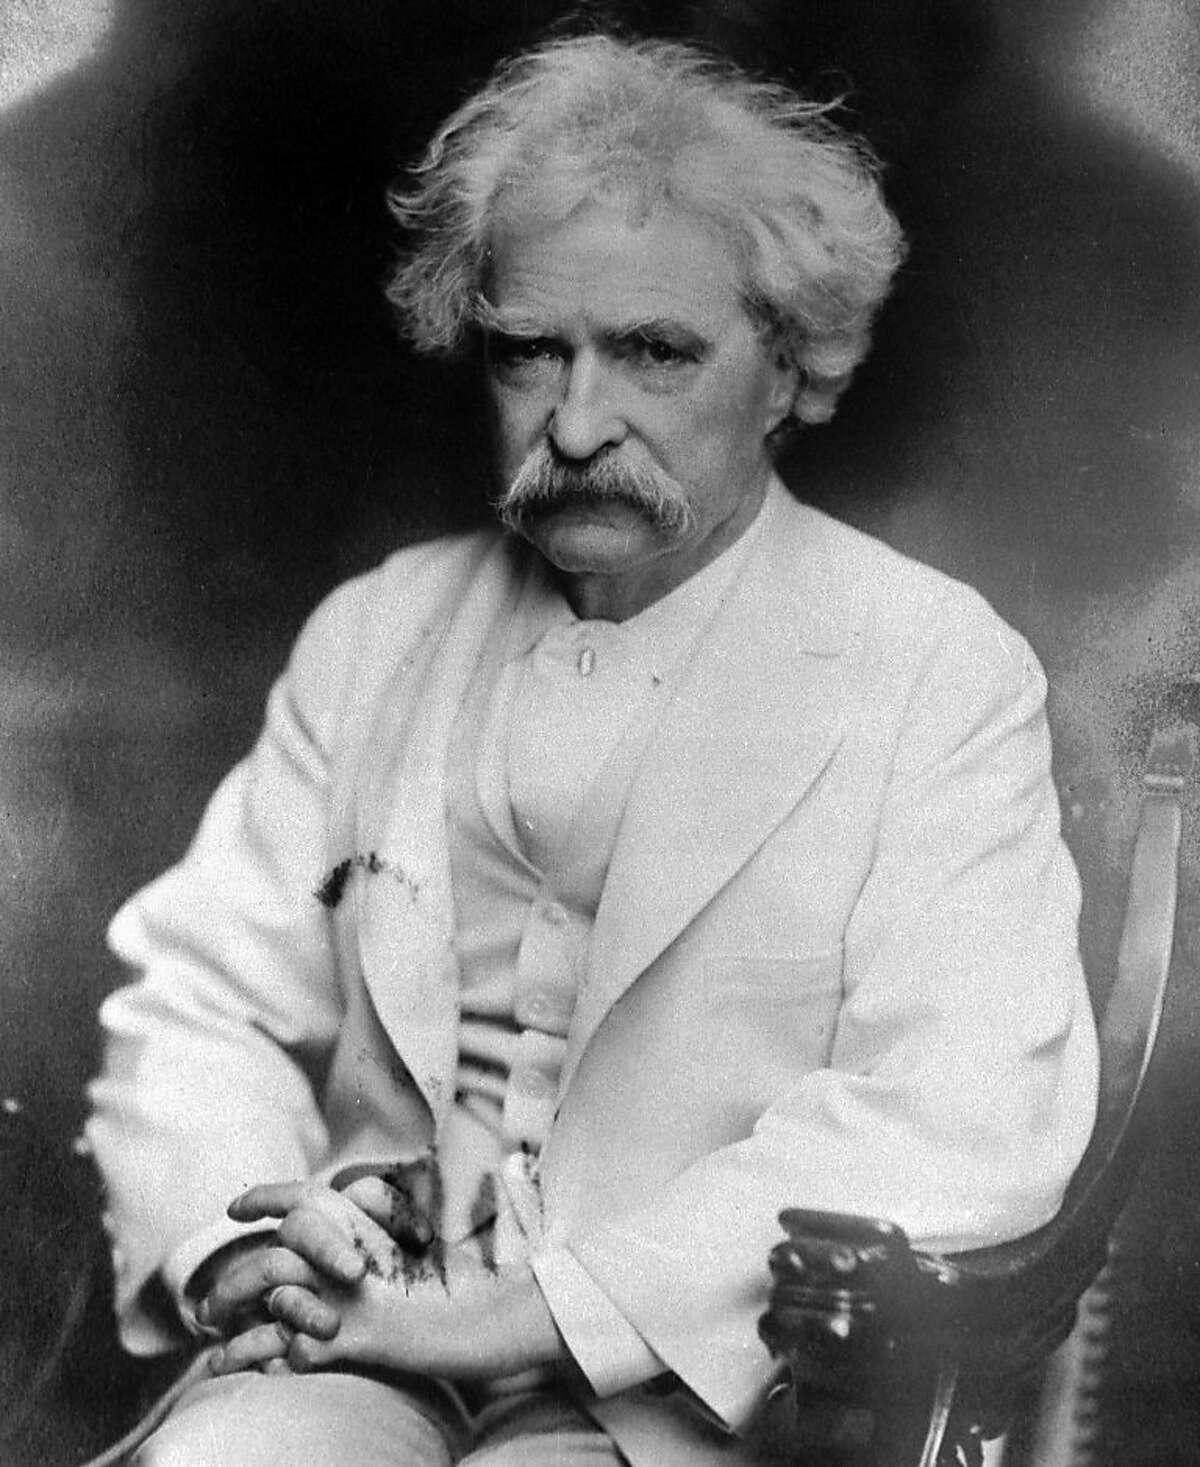 Author Samuel Longhorne Clemens, better known under his pen name, Mark Twain